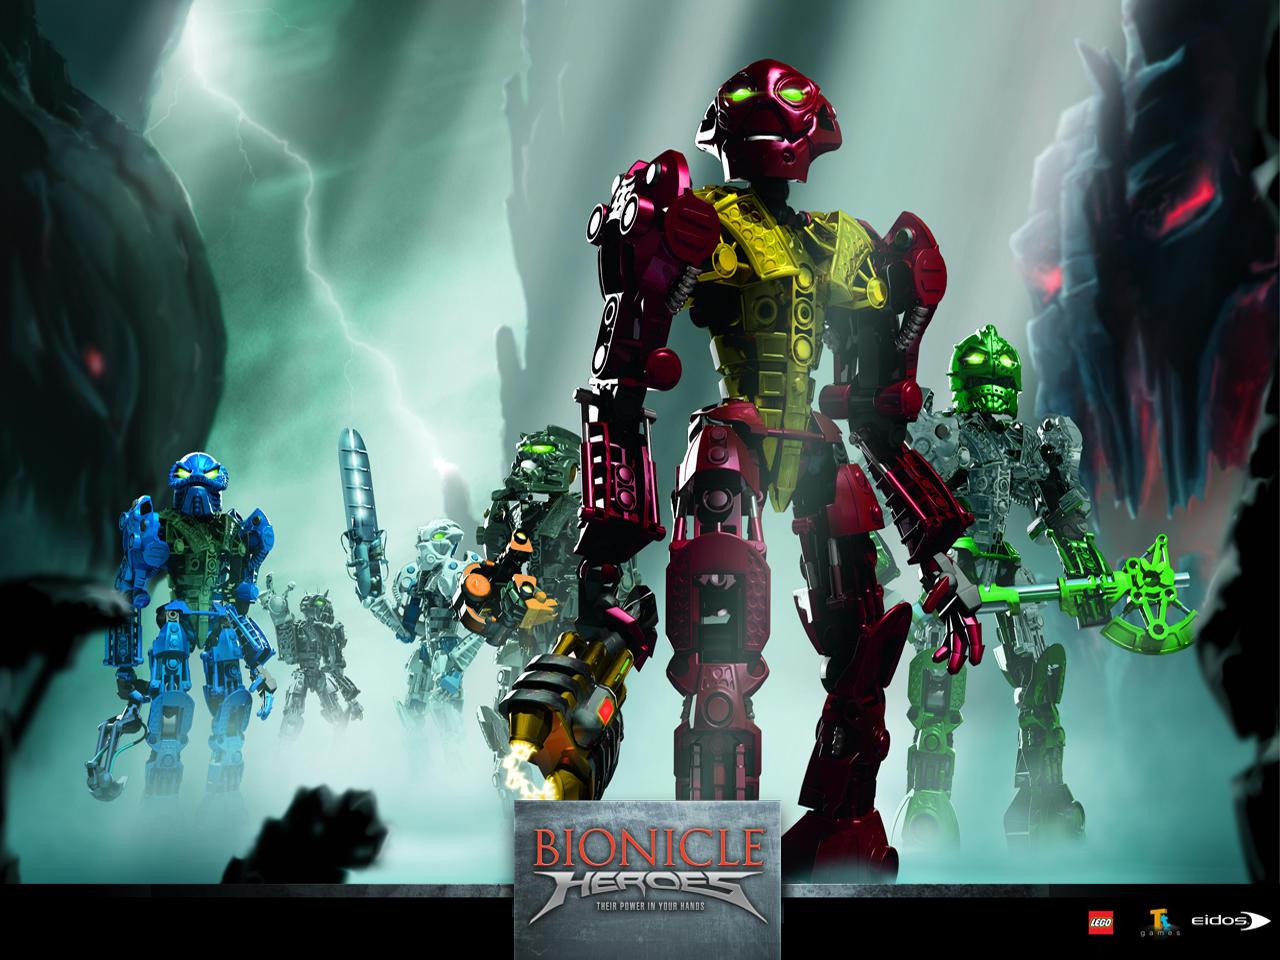 Bionicle the game trailer 2 casino rama orillia address